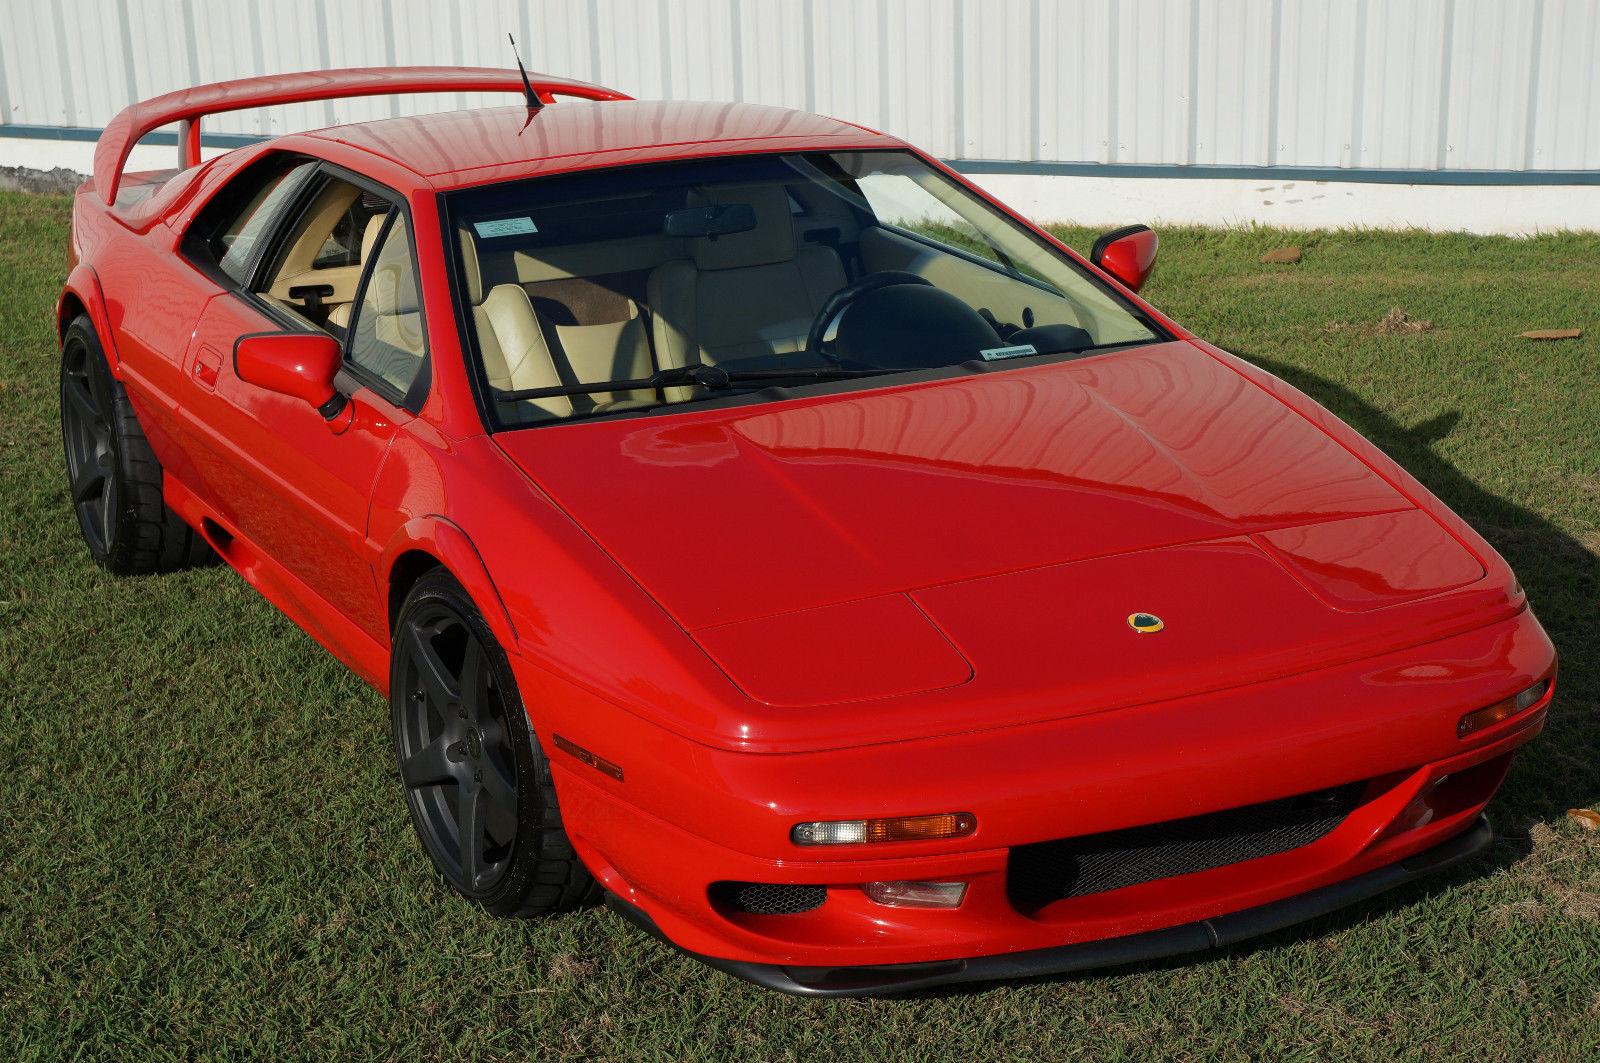 1998 lotus esprit v8 twin turbo super car saturday. Black Bedroom Furniture Sets. Home Design Ideas